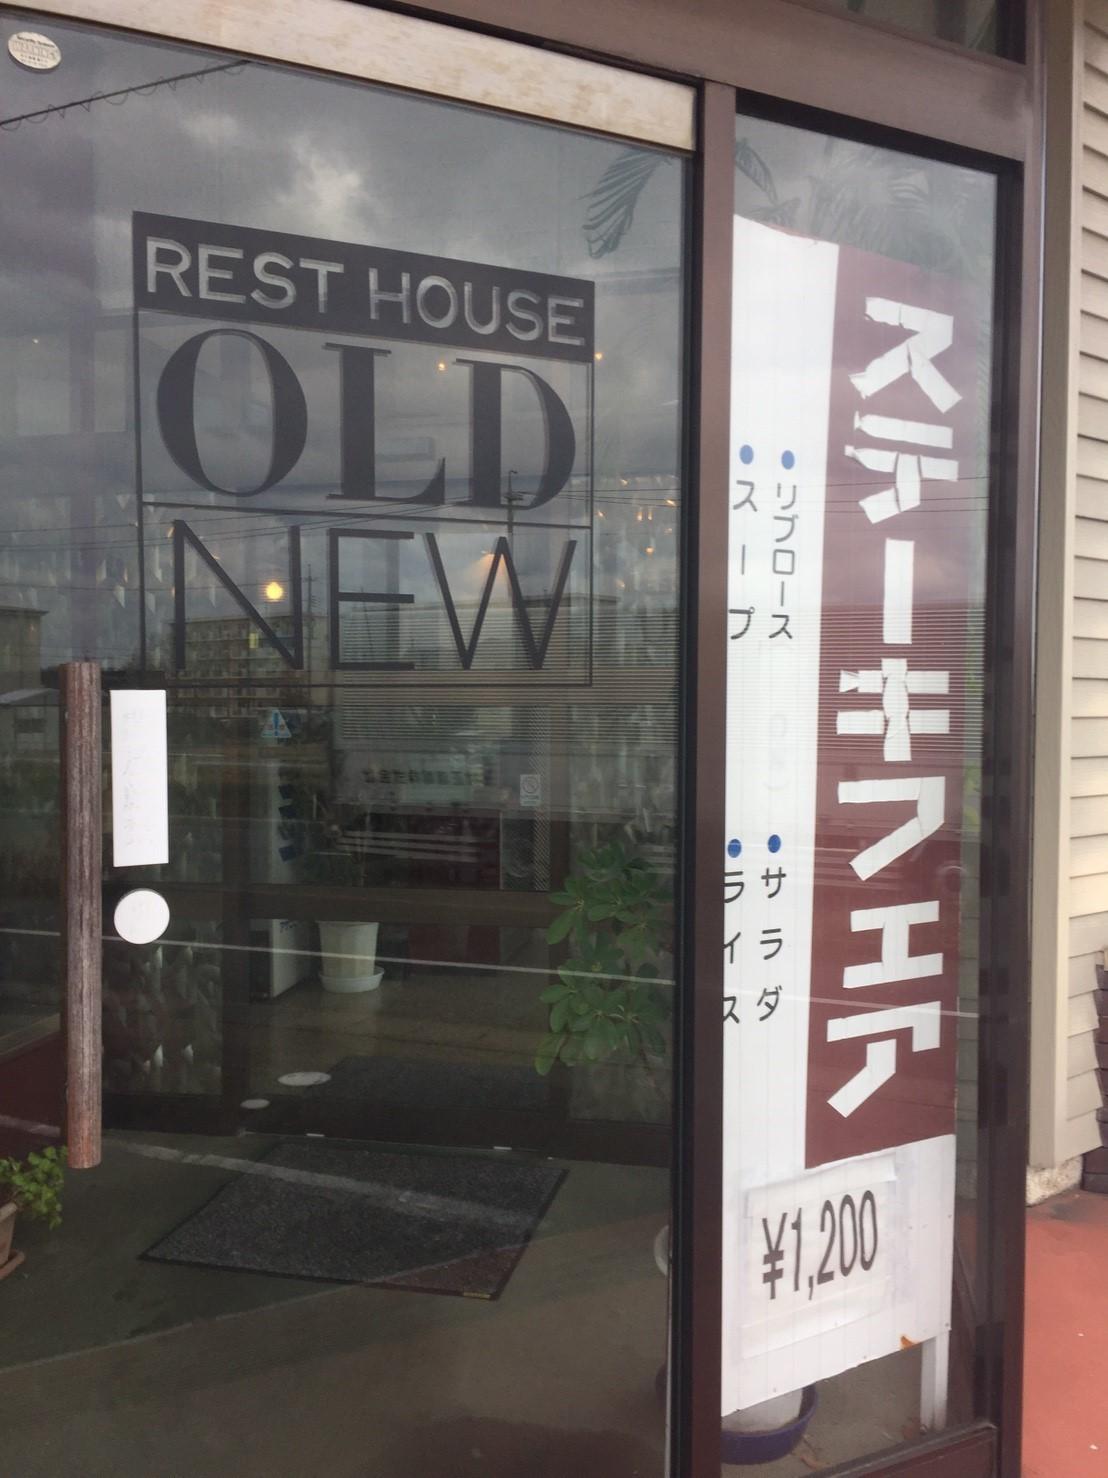 REST HOUSE OLD NEW ランチ記録_e0115904_10083707.jpg